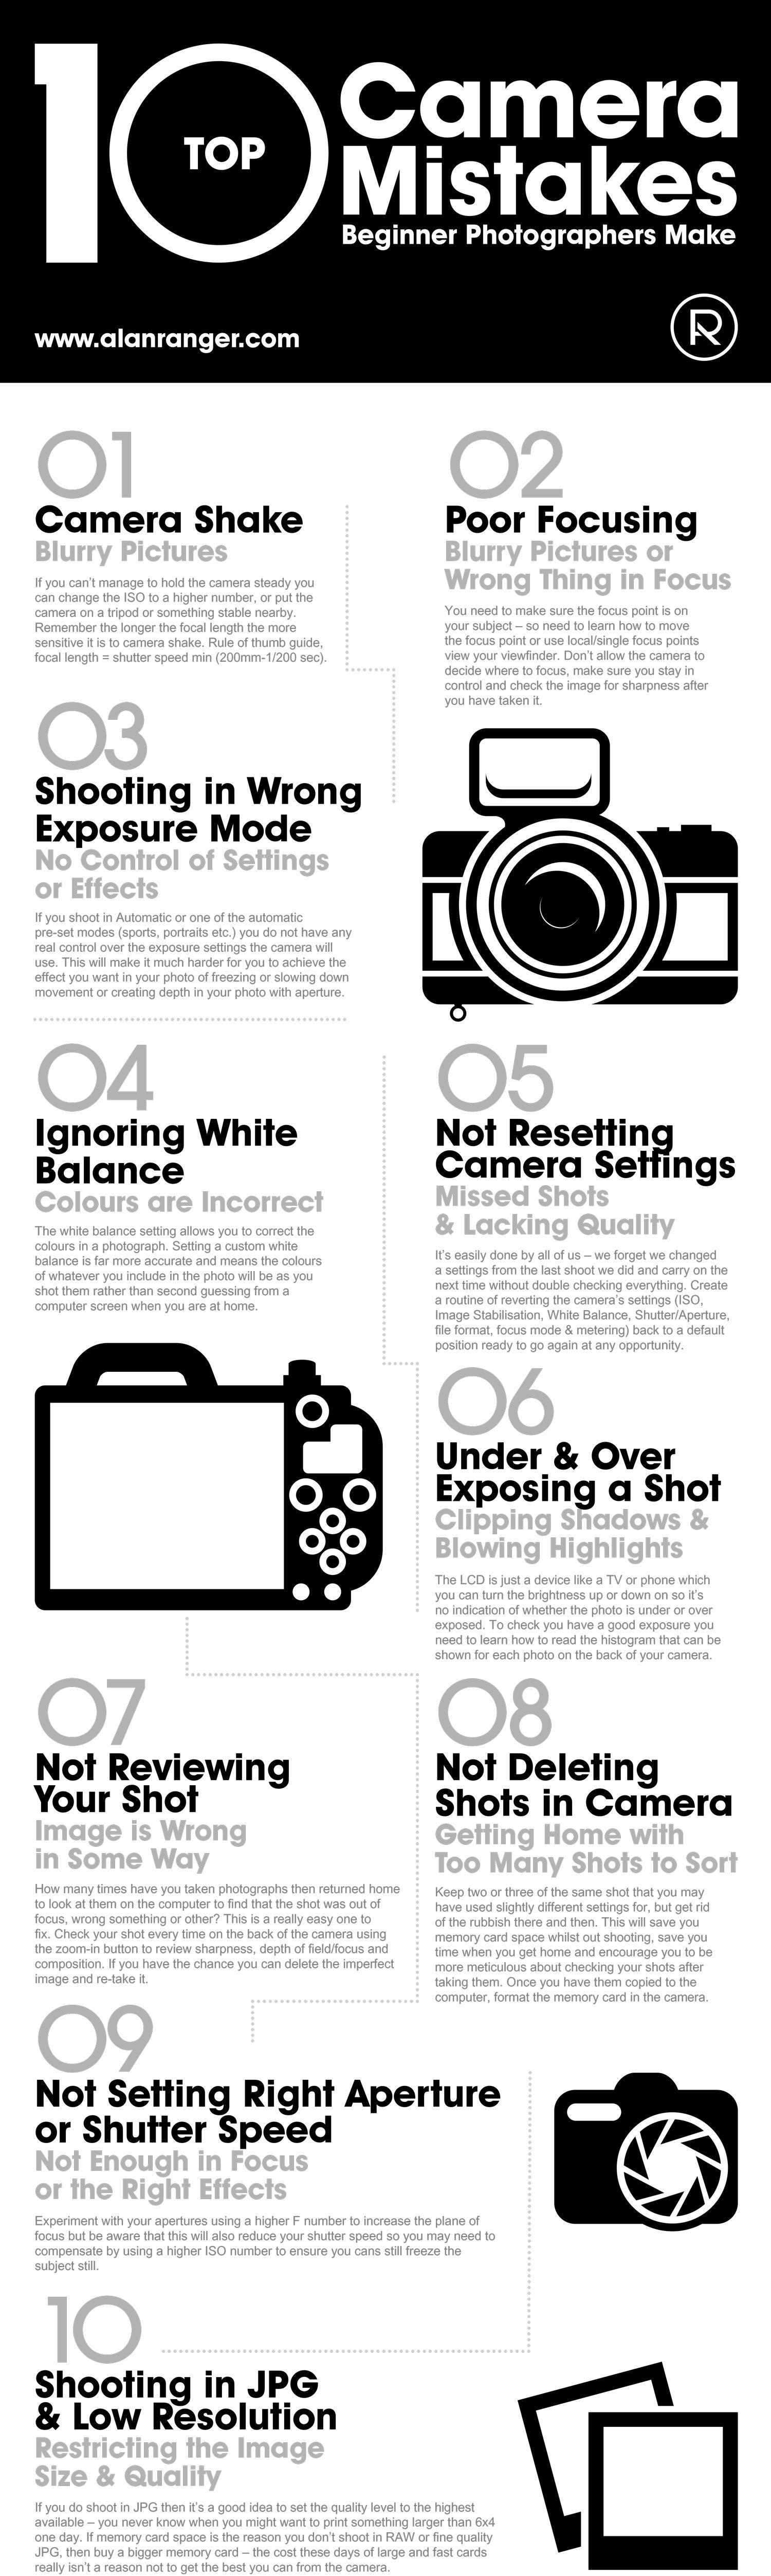 10 camera mistakes infographics.JPG